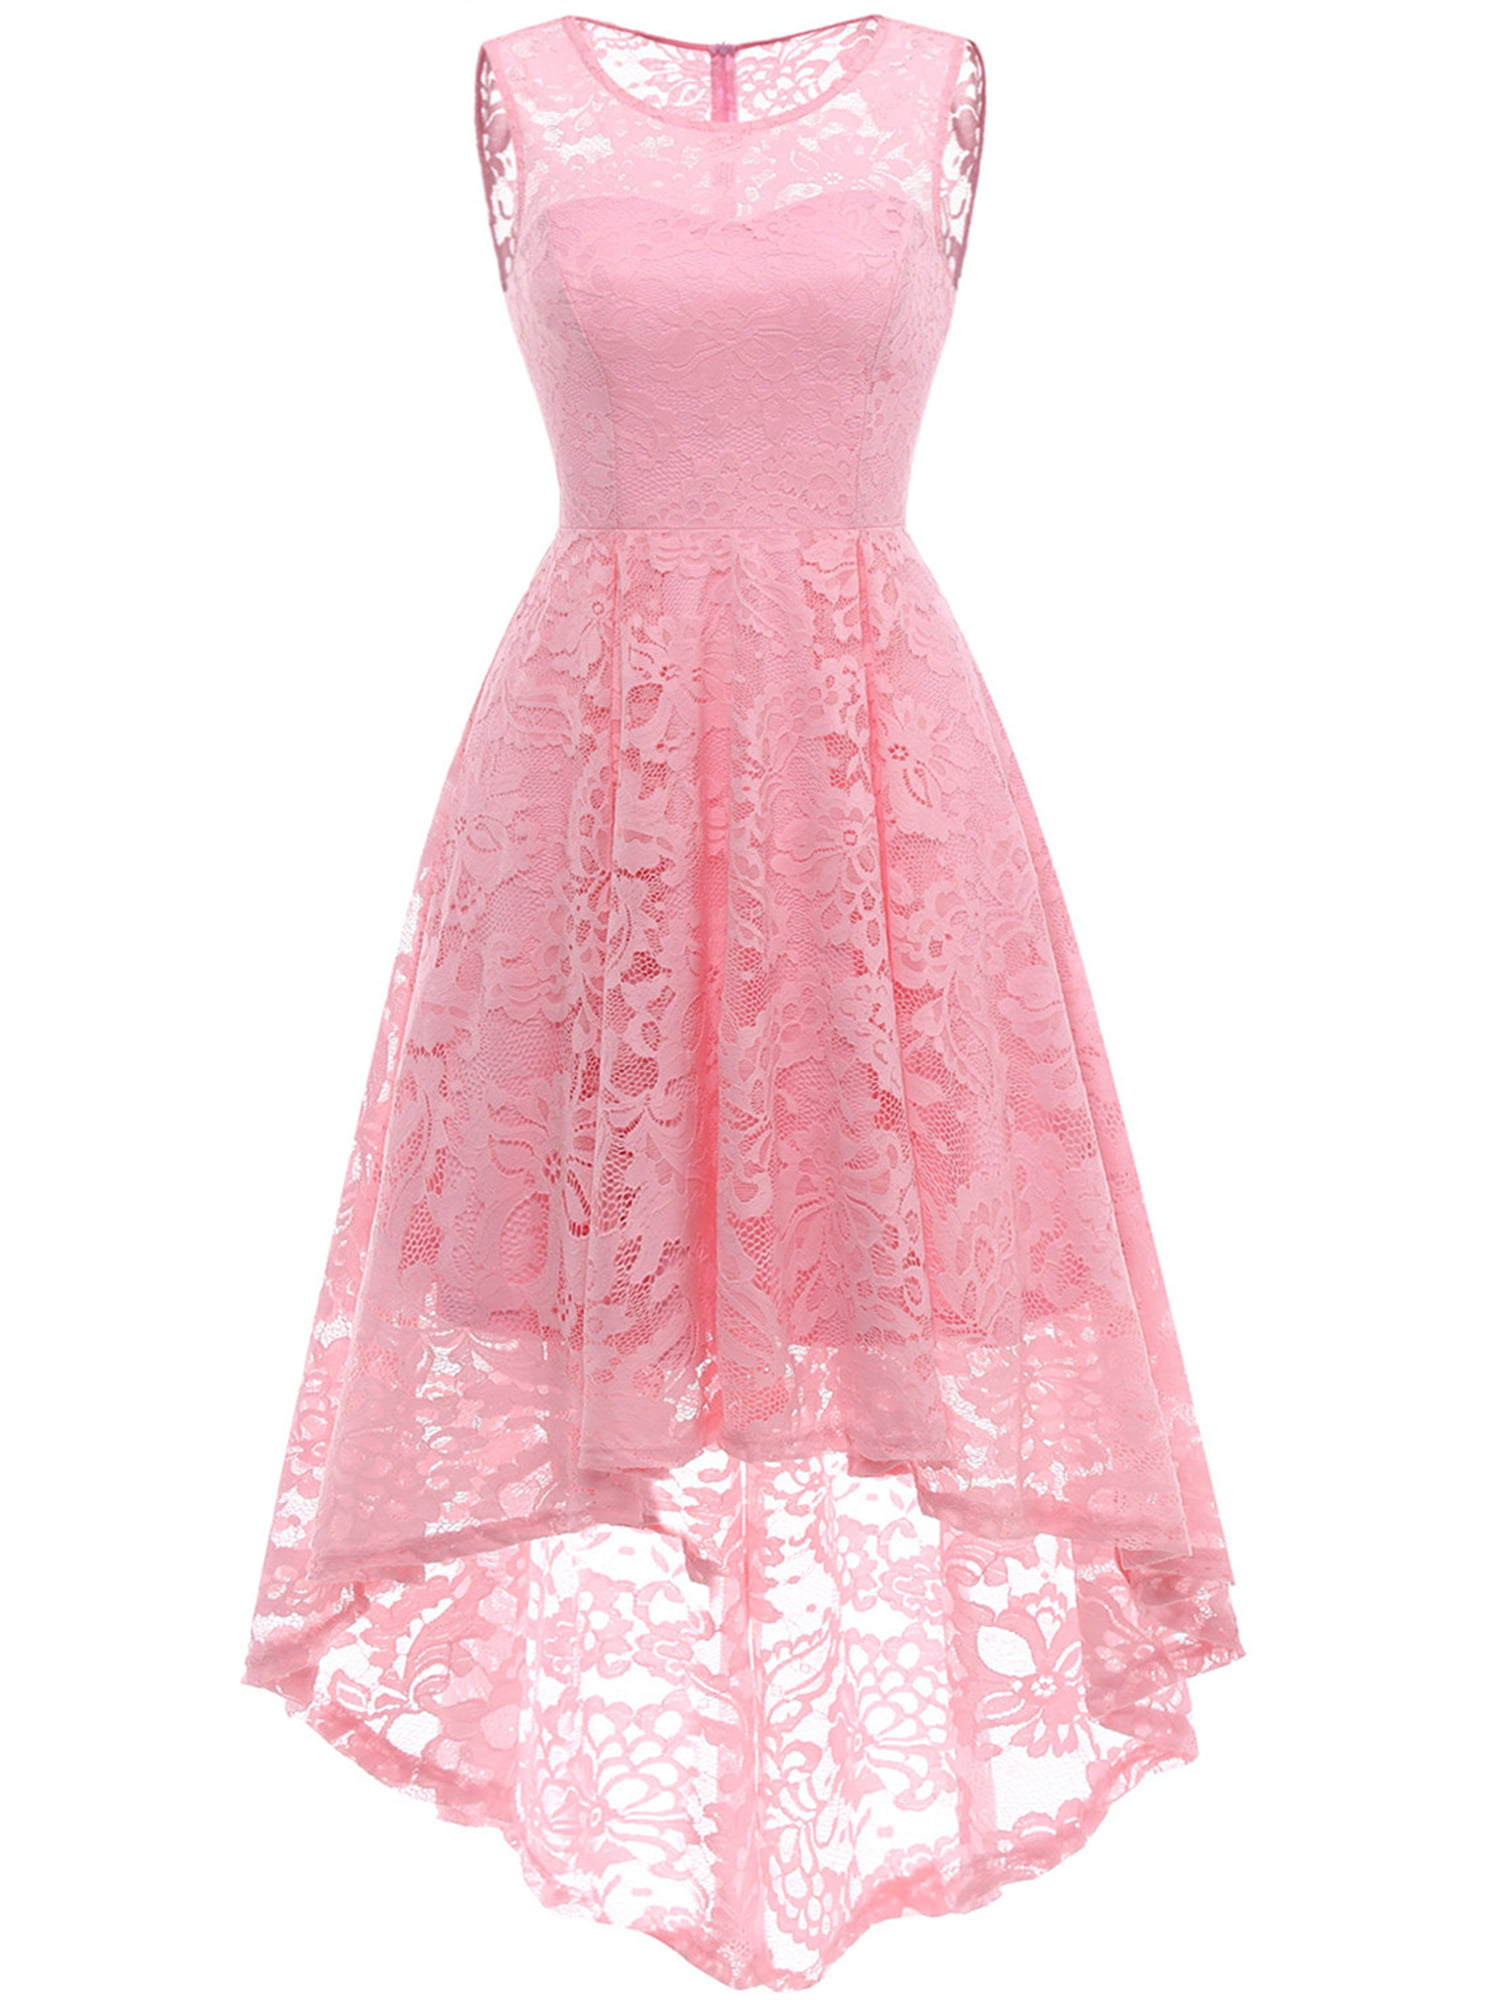 Womens Black Evening Dress Lace Layout Hi-lo Maxi Prom Dresses